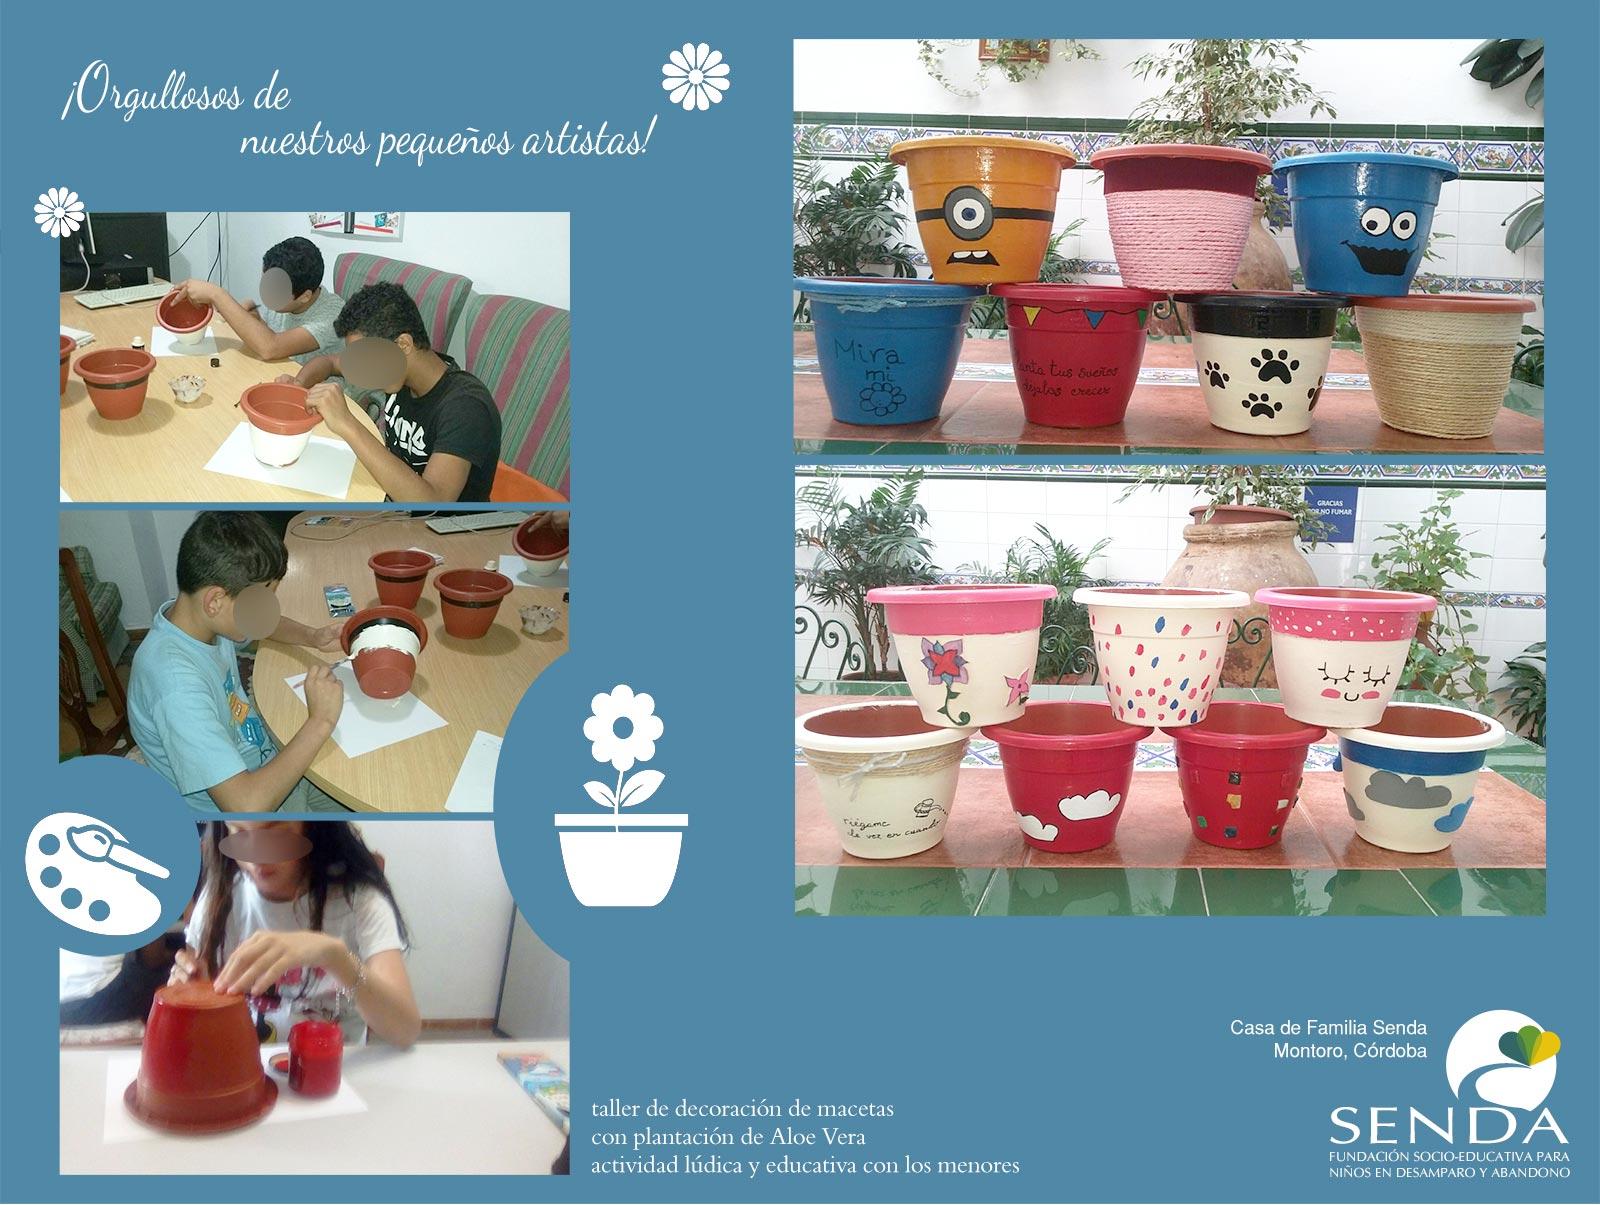 Taller decoración macetas aloe vera Casa de Familia Fundación Senda